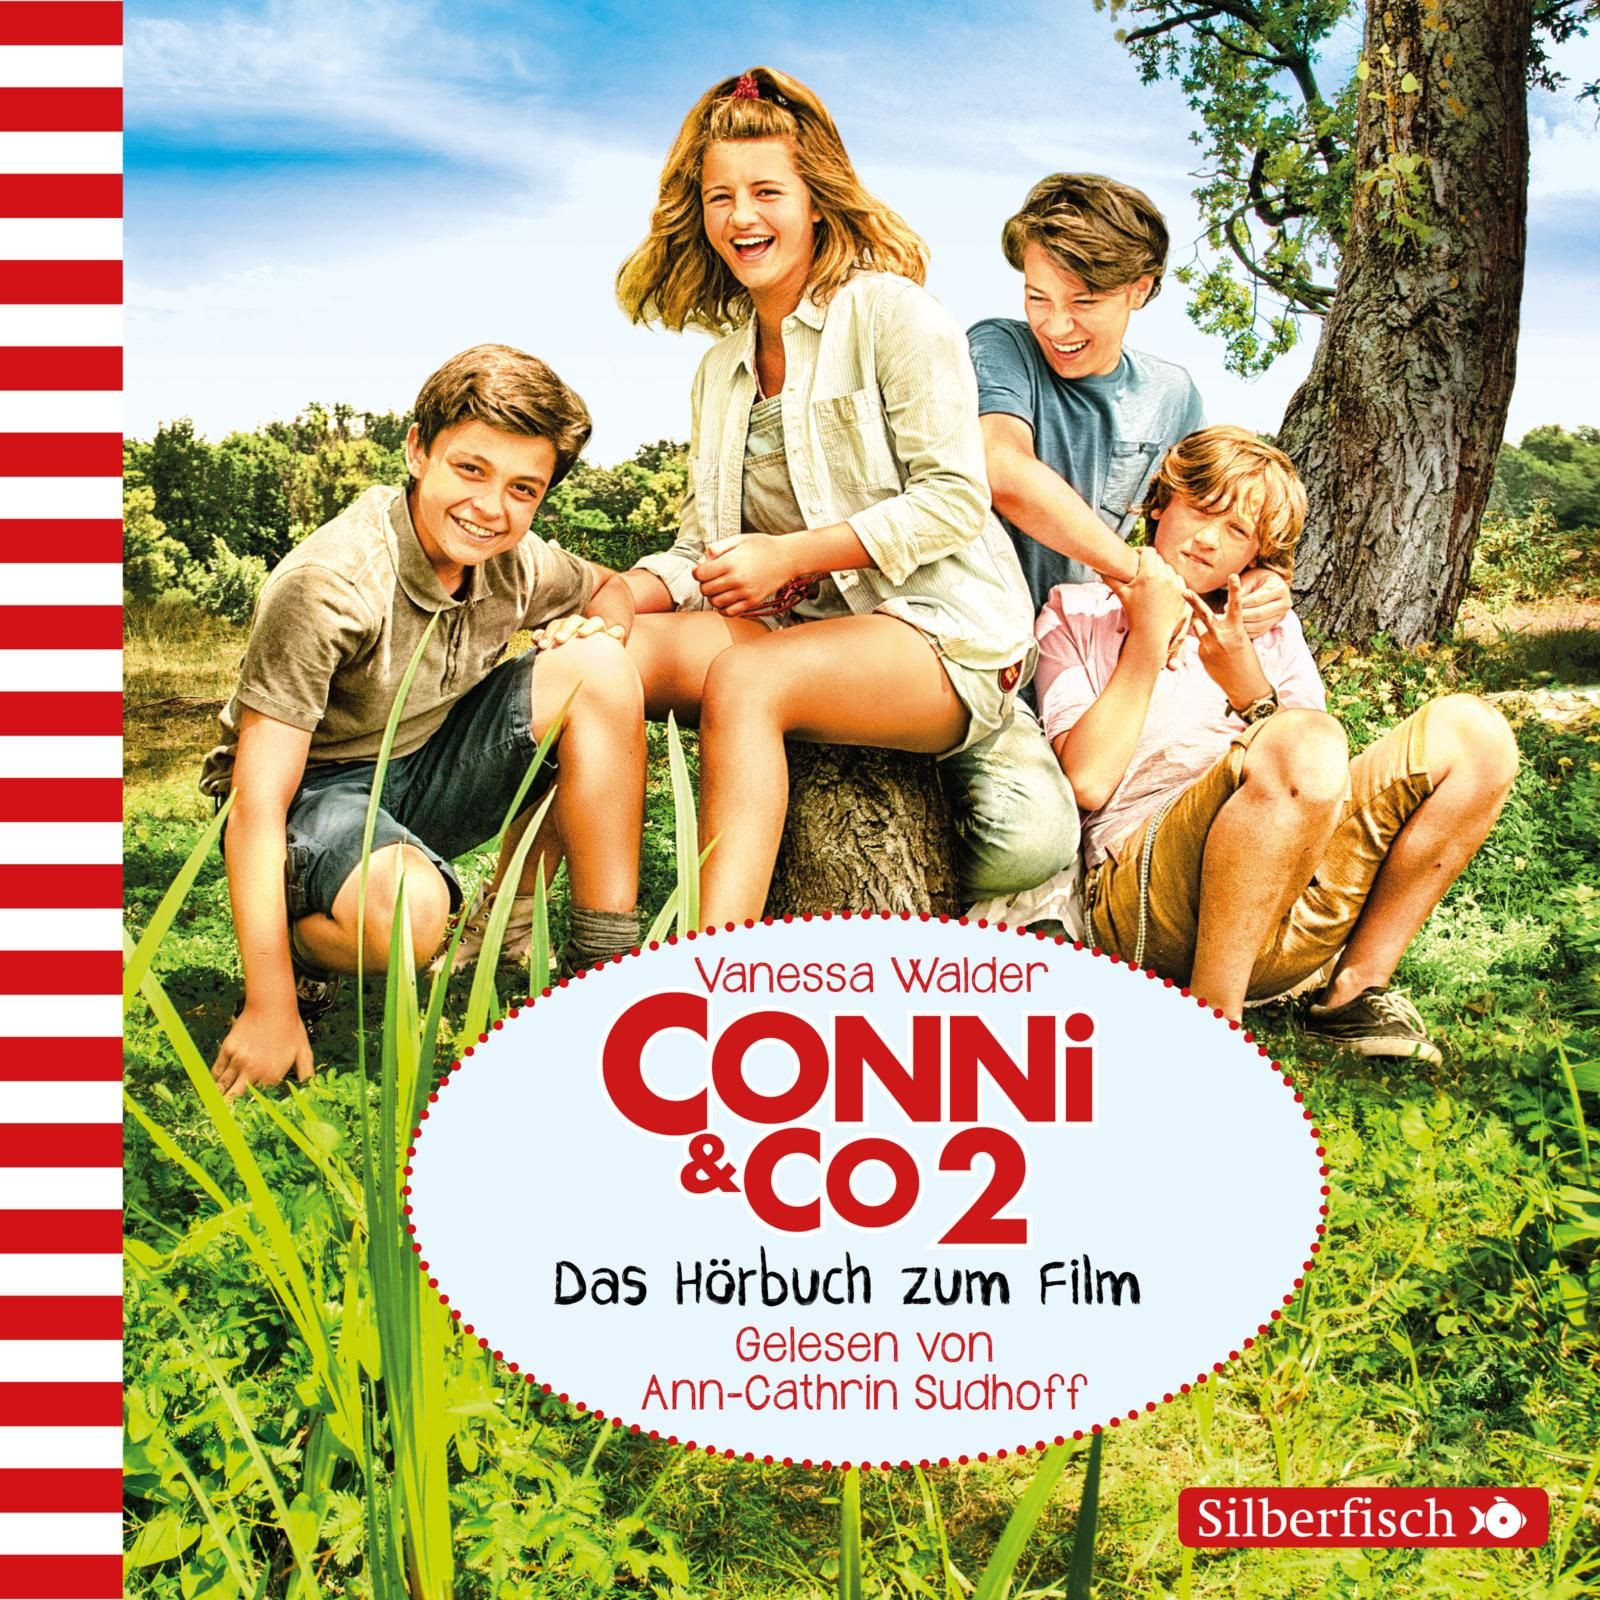 conni  co 2  das hörbuch zum film  popde